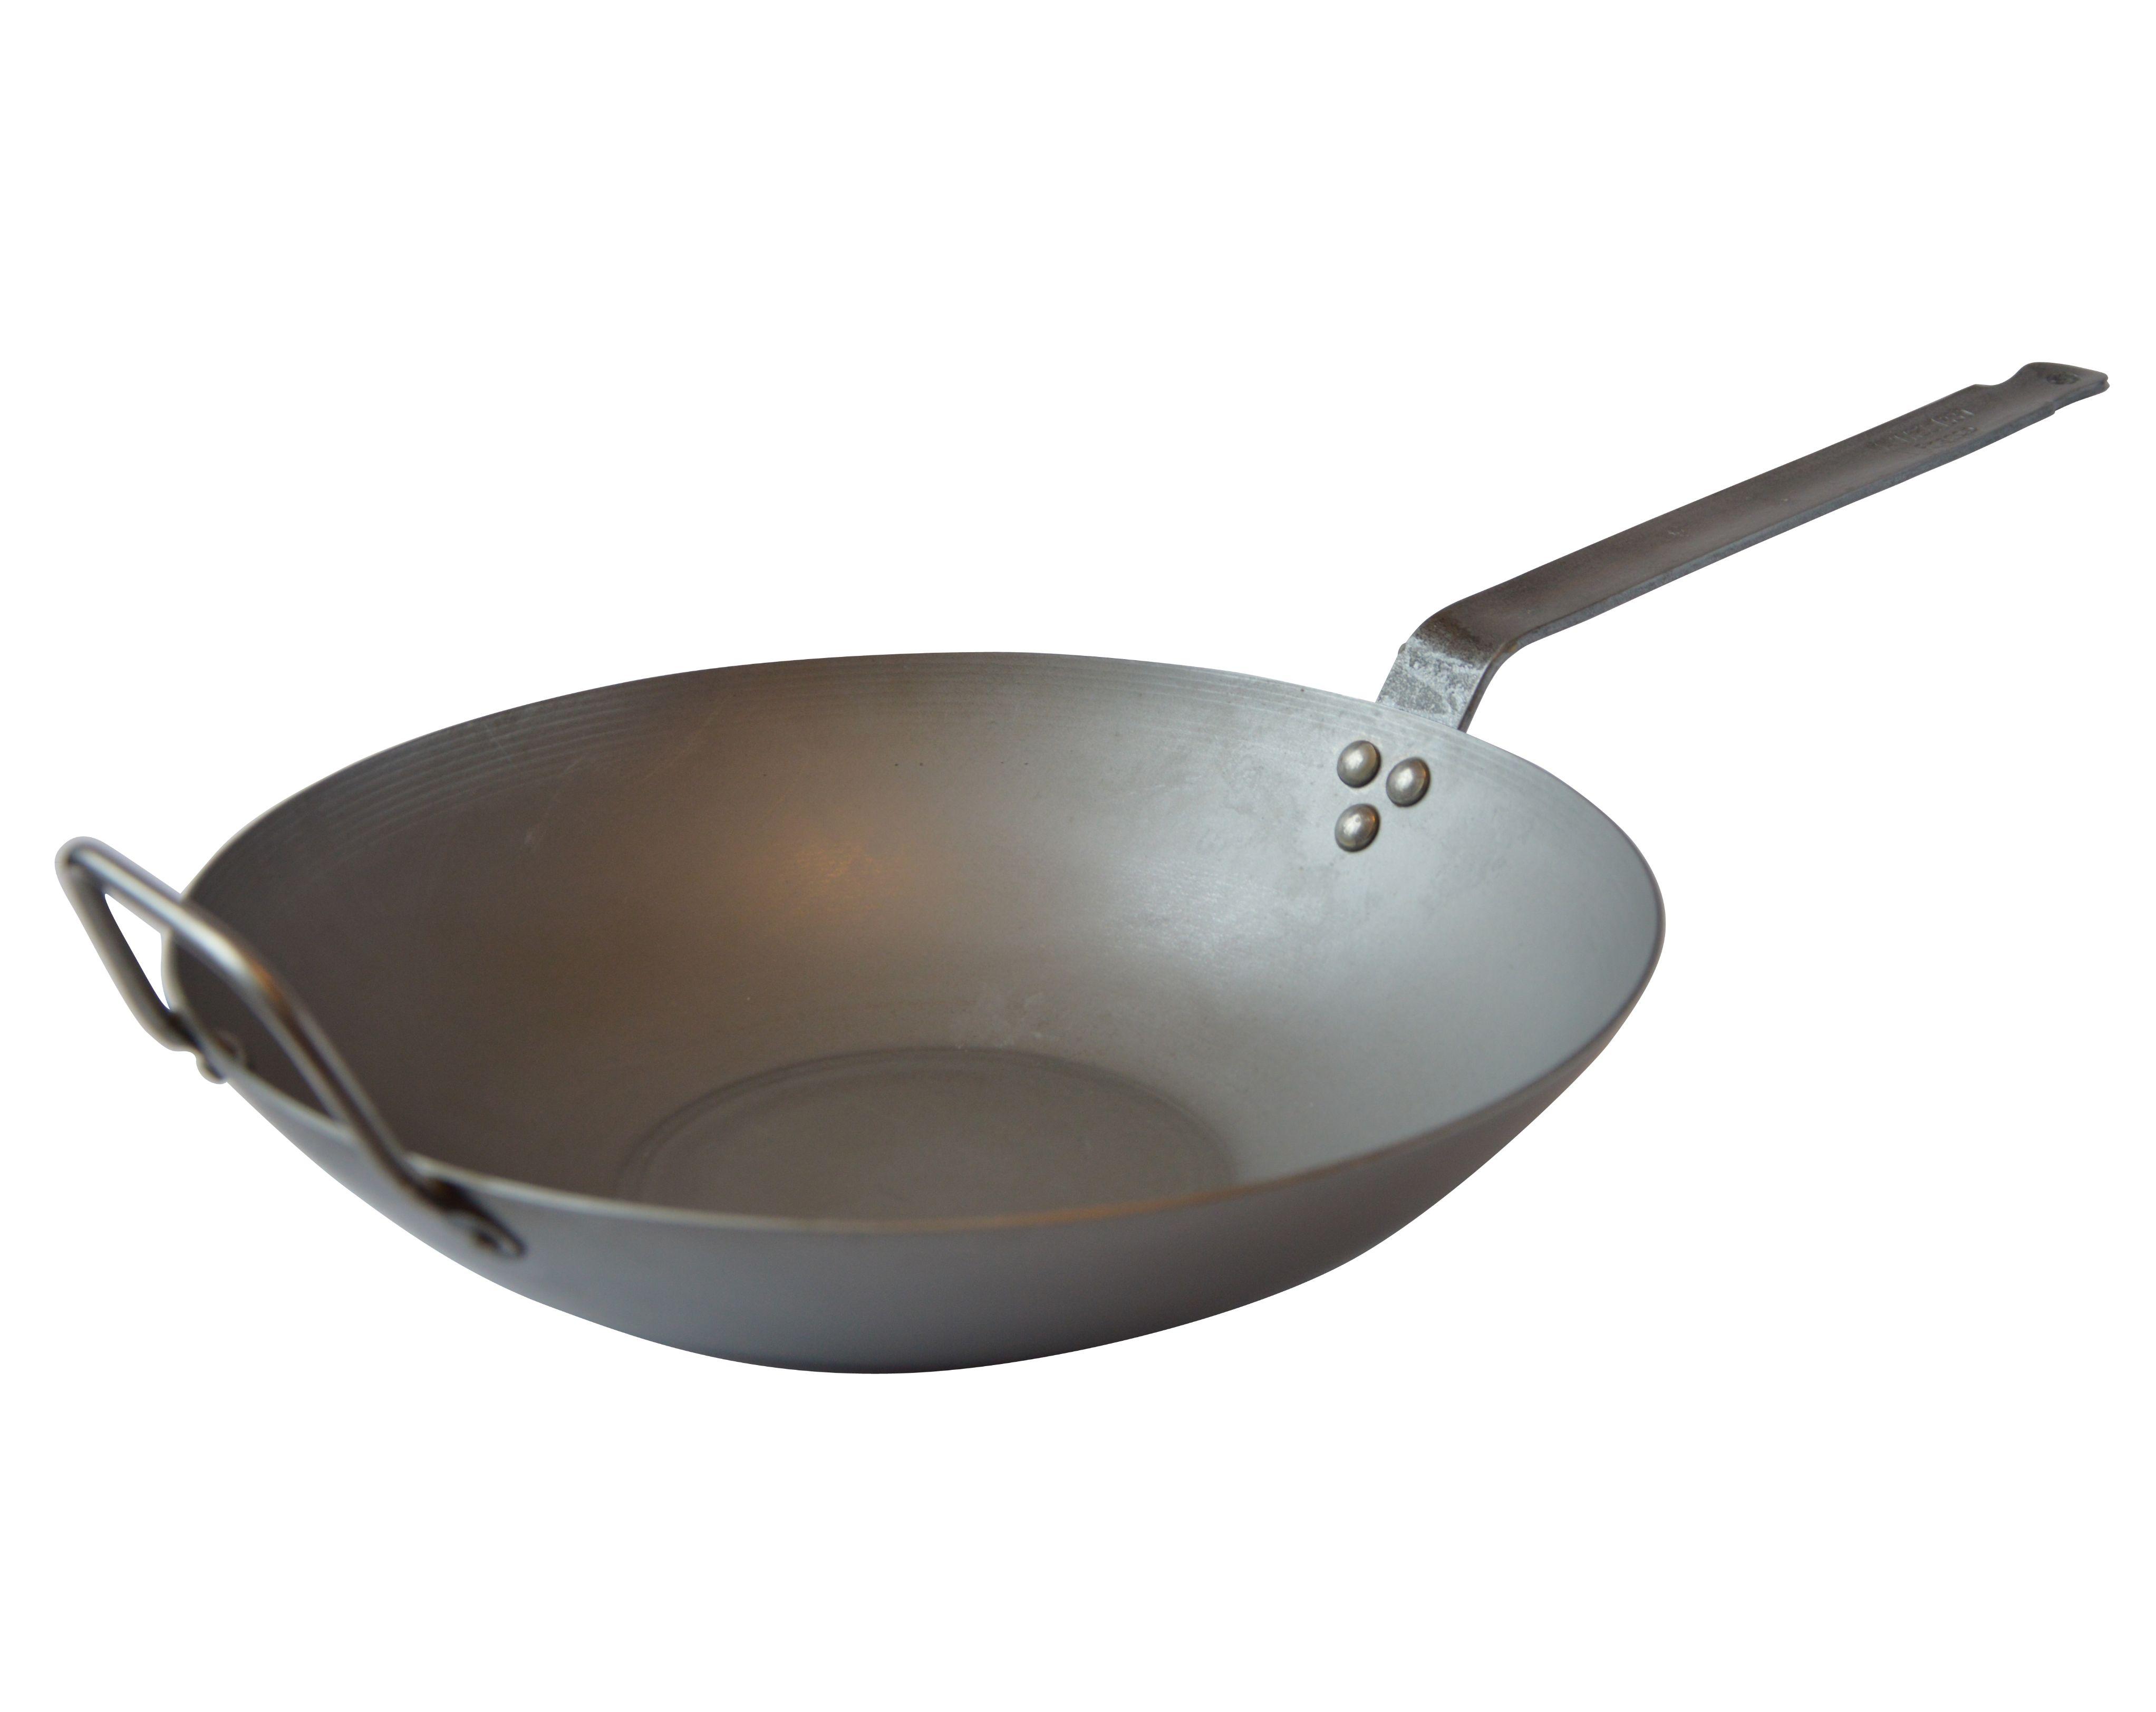 Mauviel wok pladejern, Ø 30 cm, stål